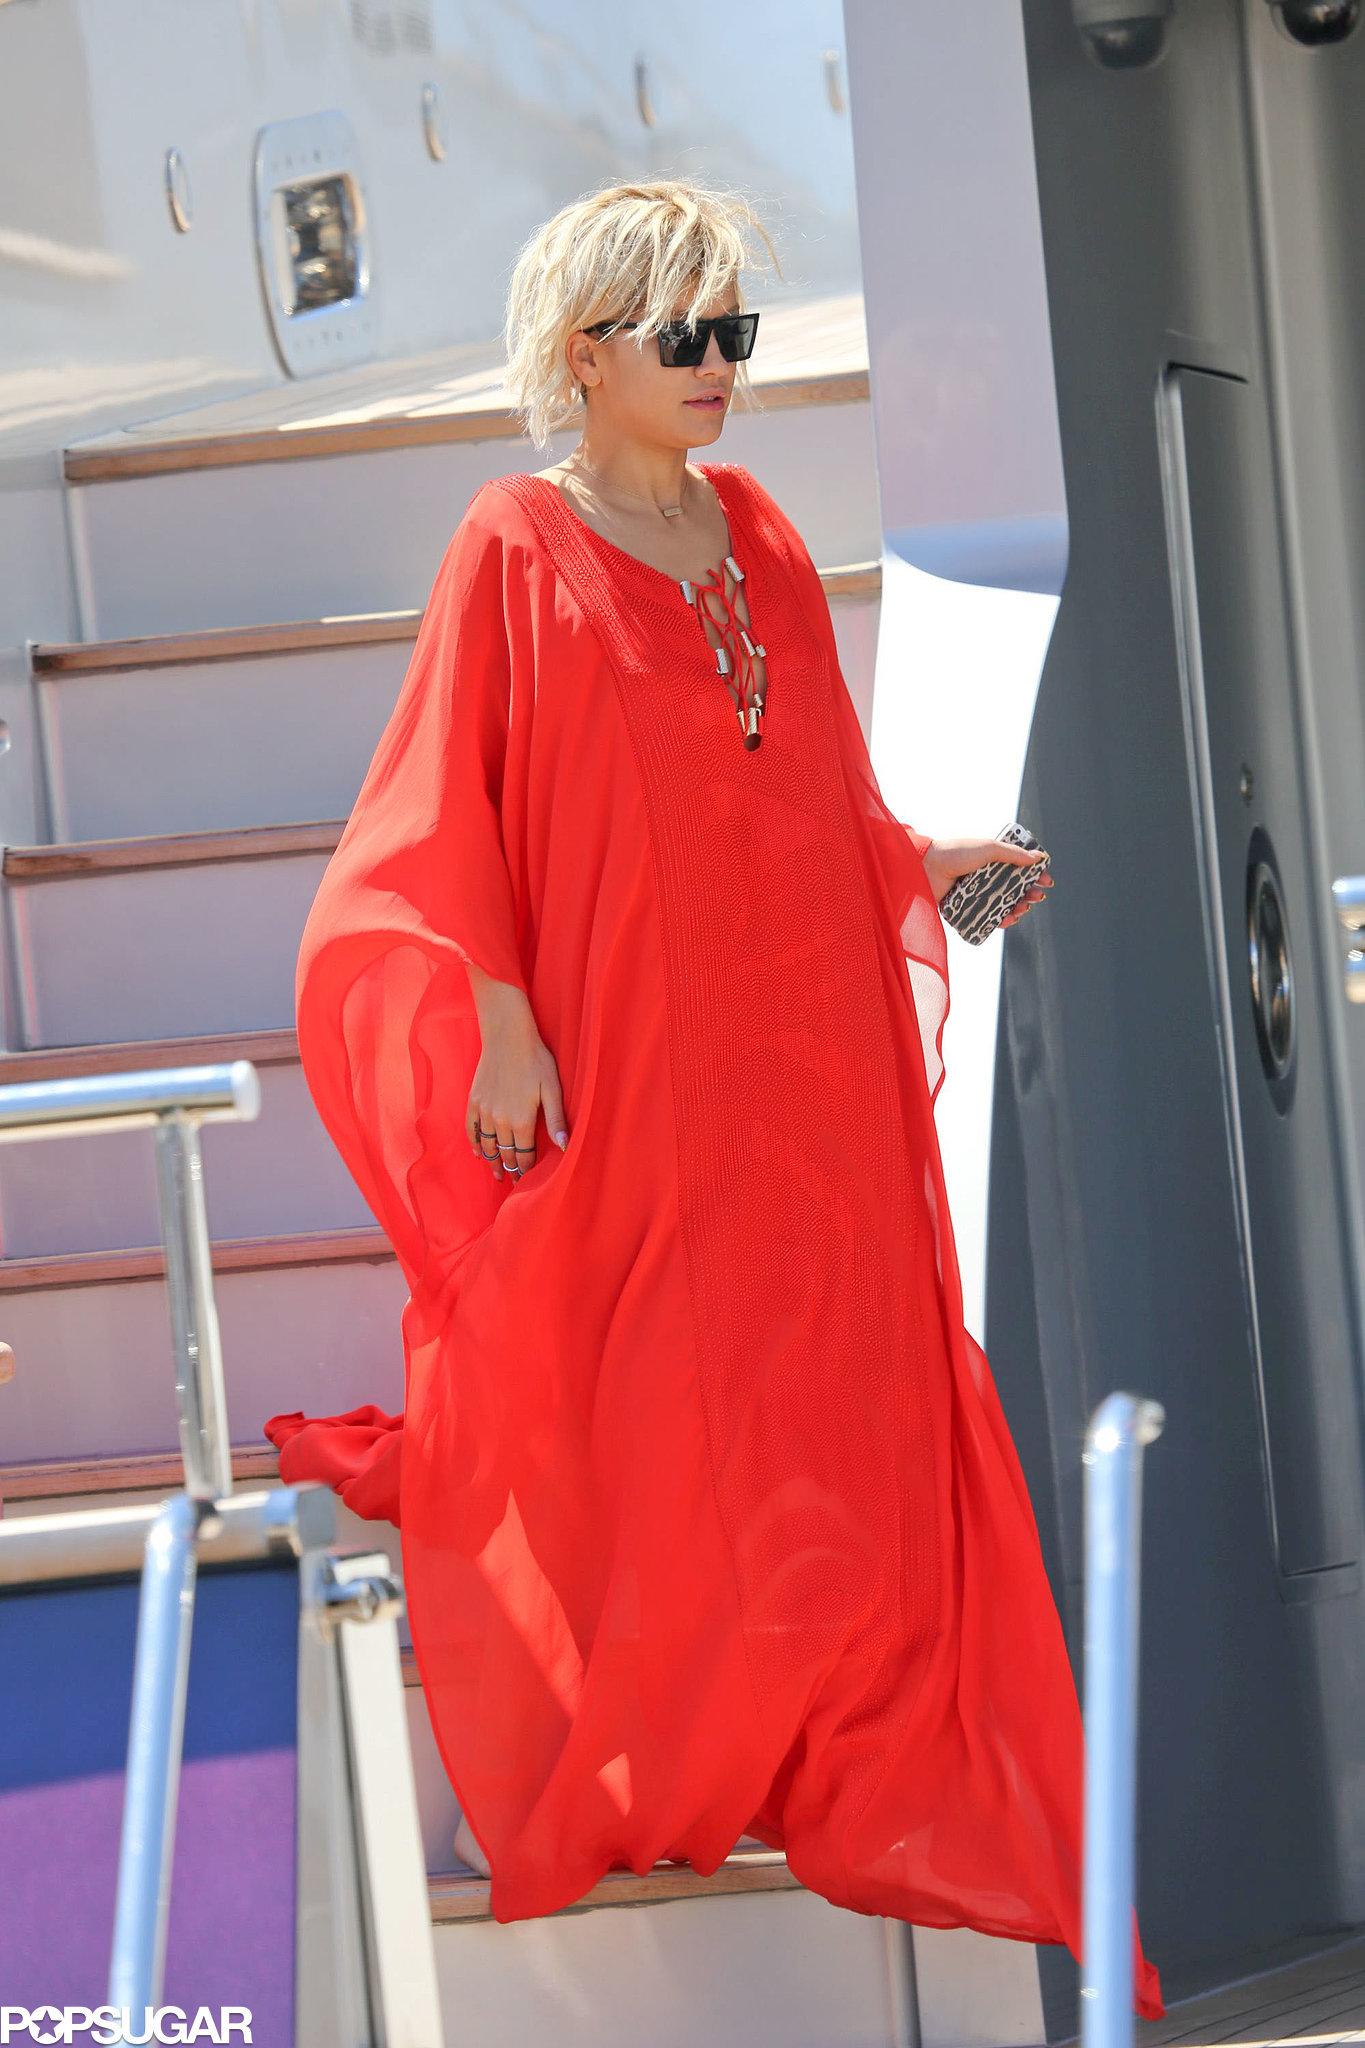 Rita Ora got comfy aboard Roberto Cavalli's yacht in Cannes, France, on Saturday.